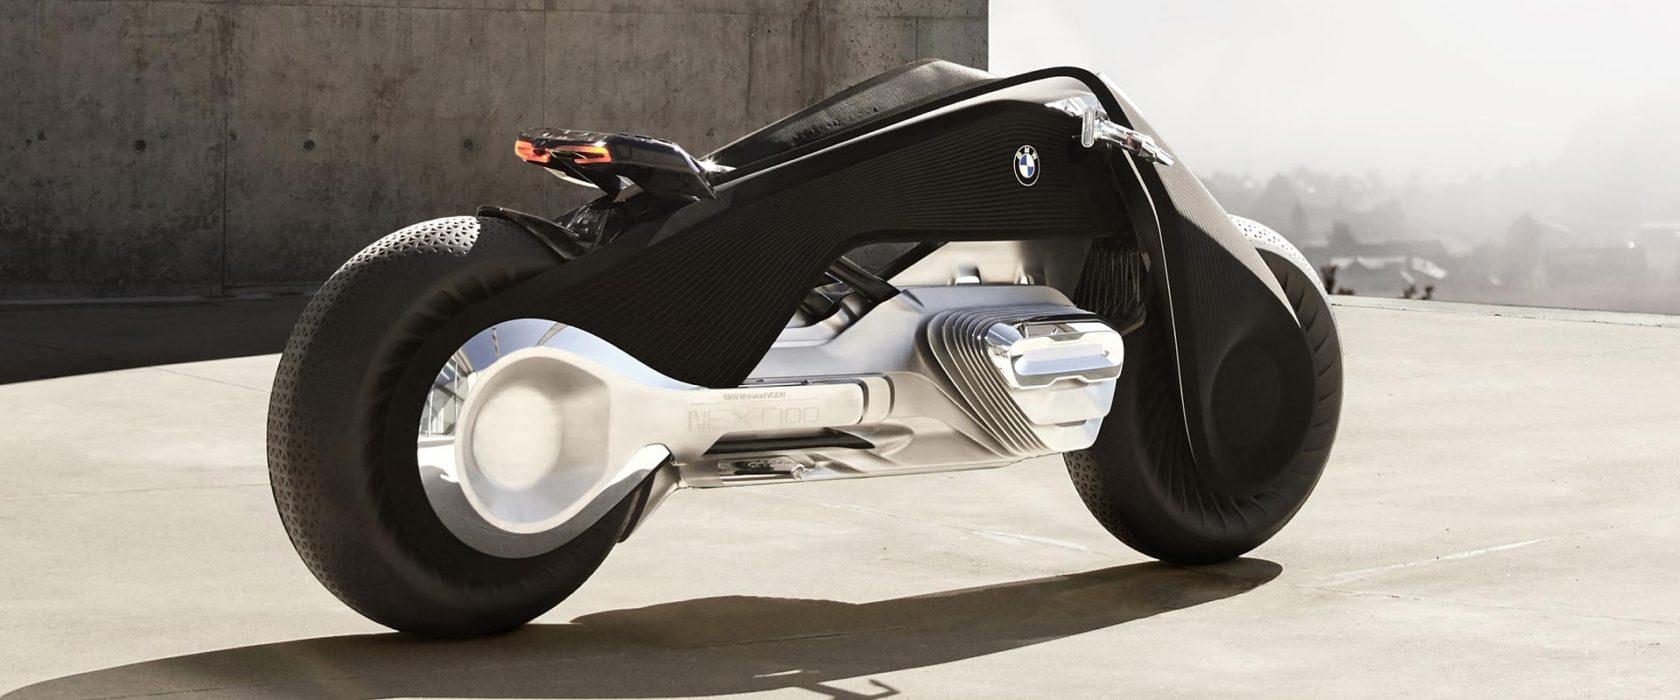 bmw motorrad vision next 100 la roadster futura concept red live. Black Bedroom Furniture Sets. Home Design Ideas